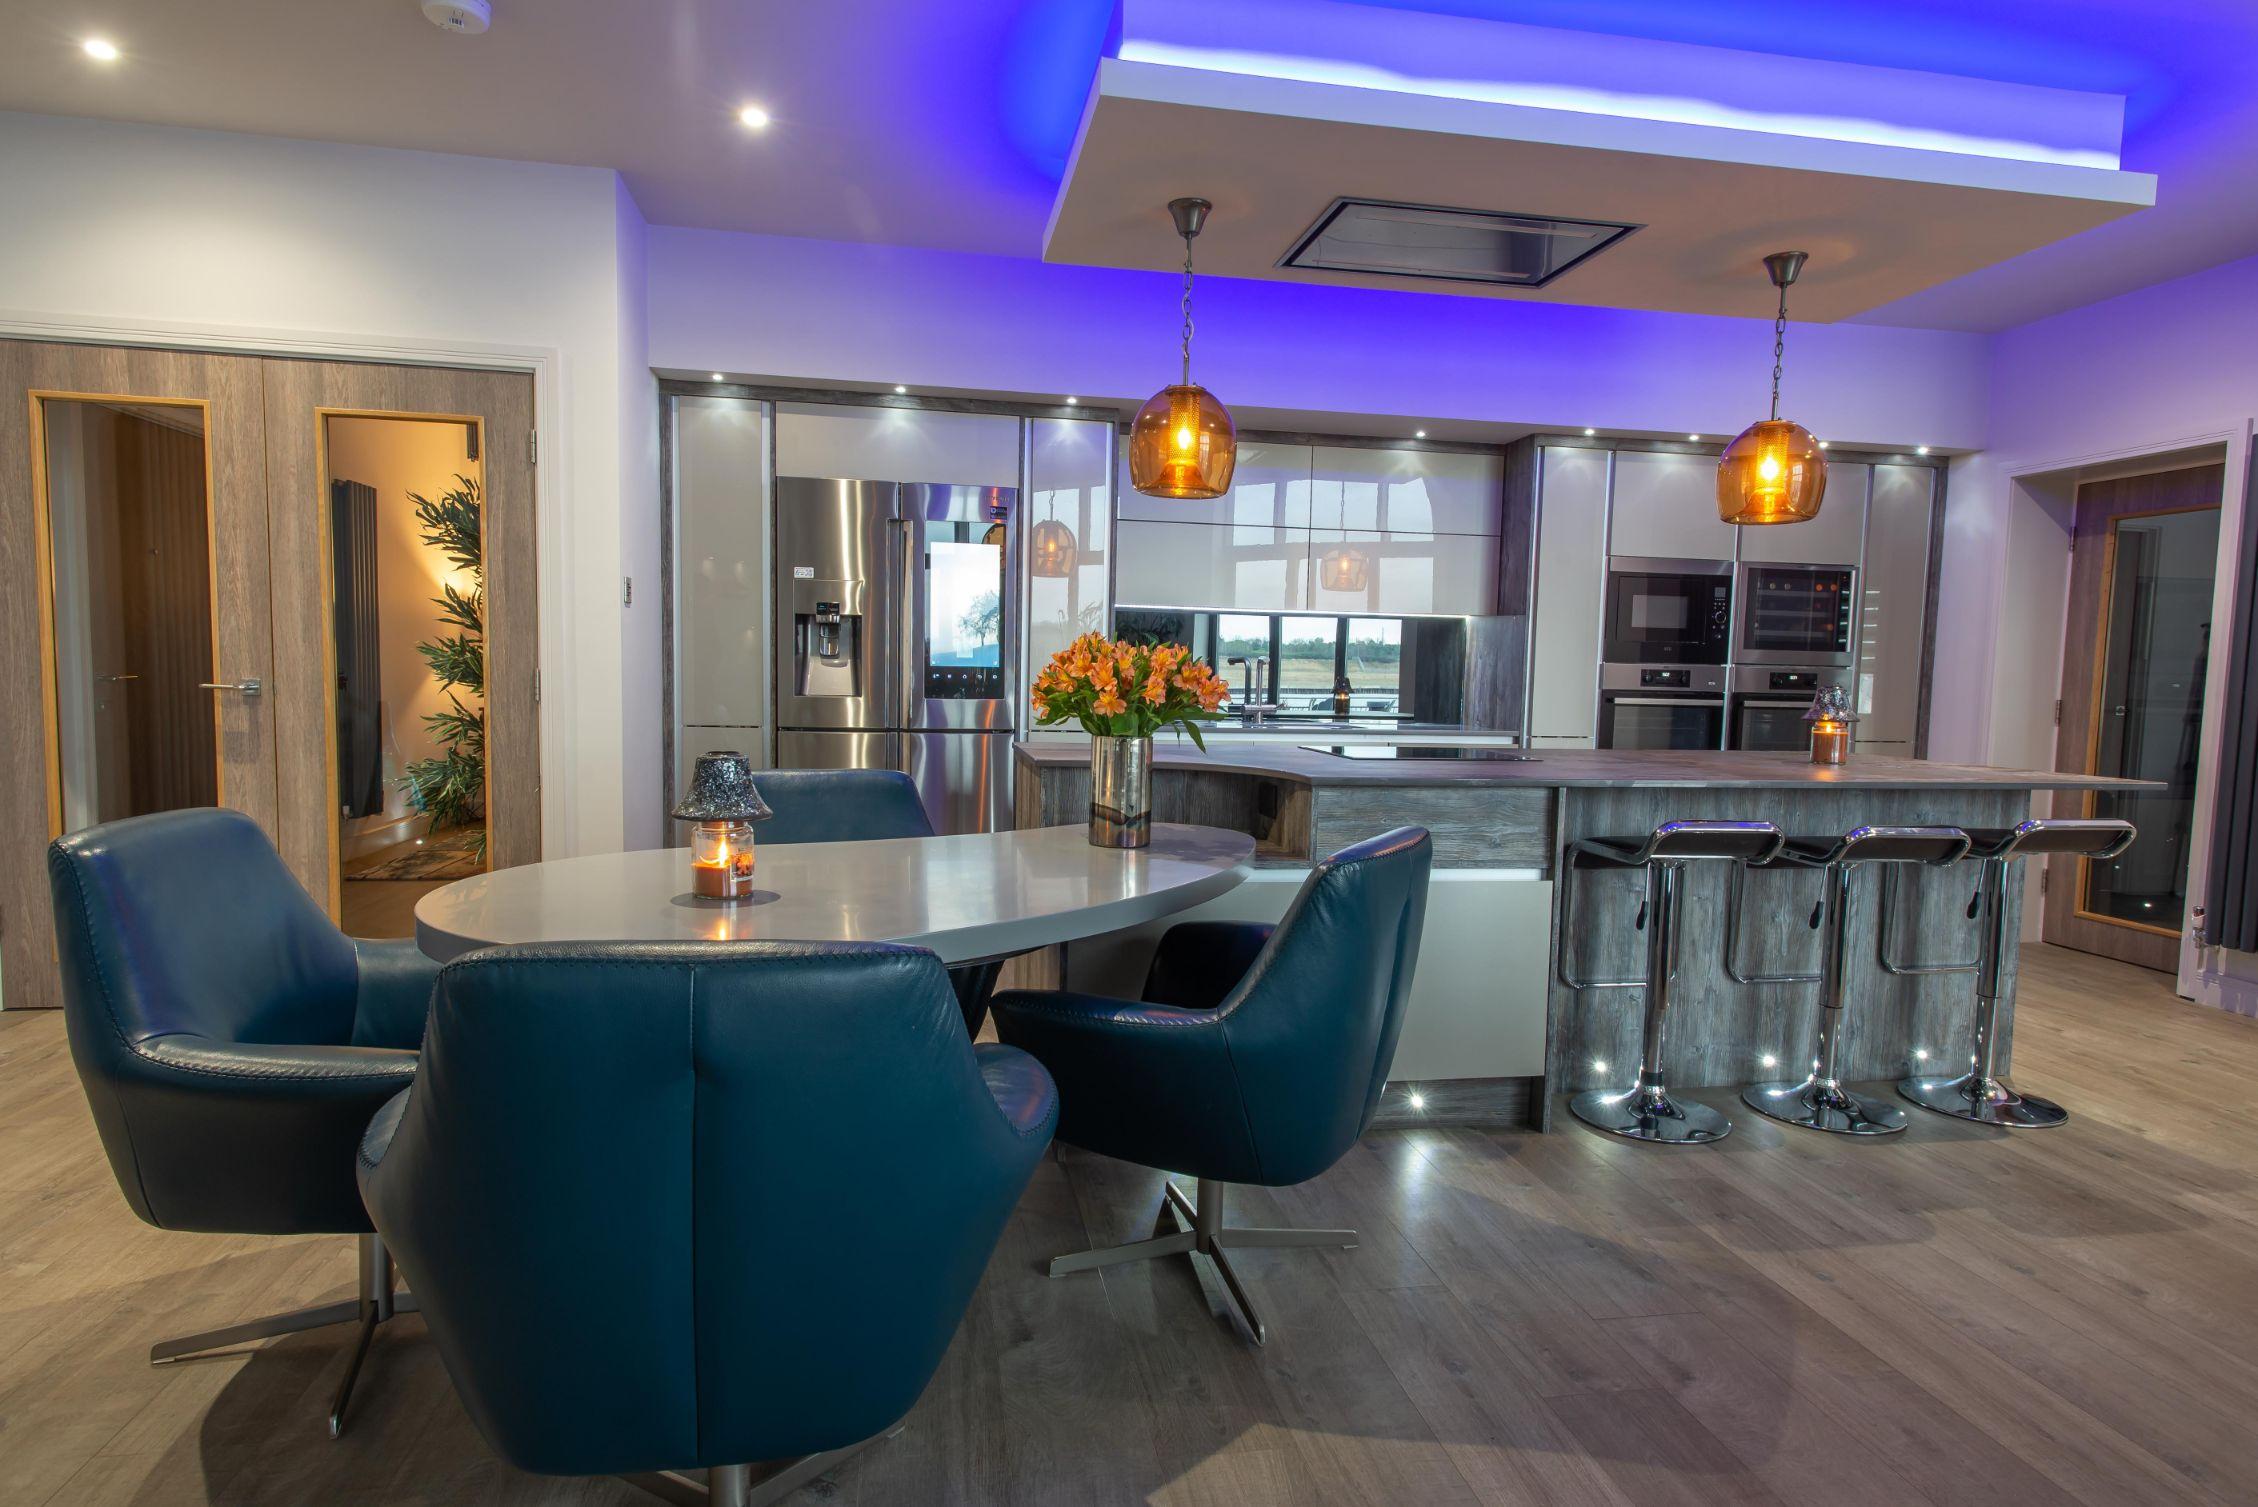 New Kitchen Project 3 - Grange Interiors